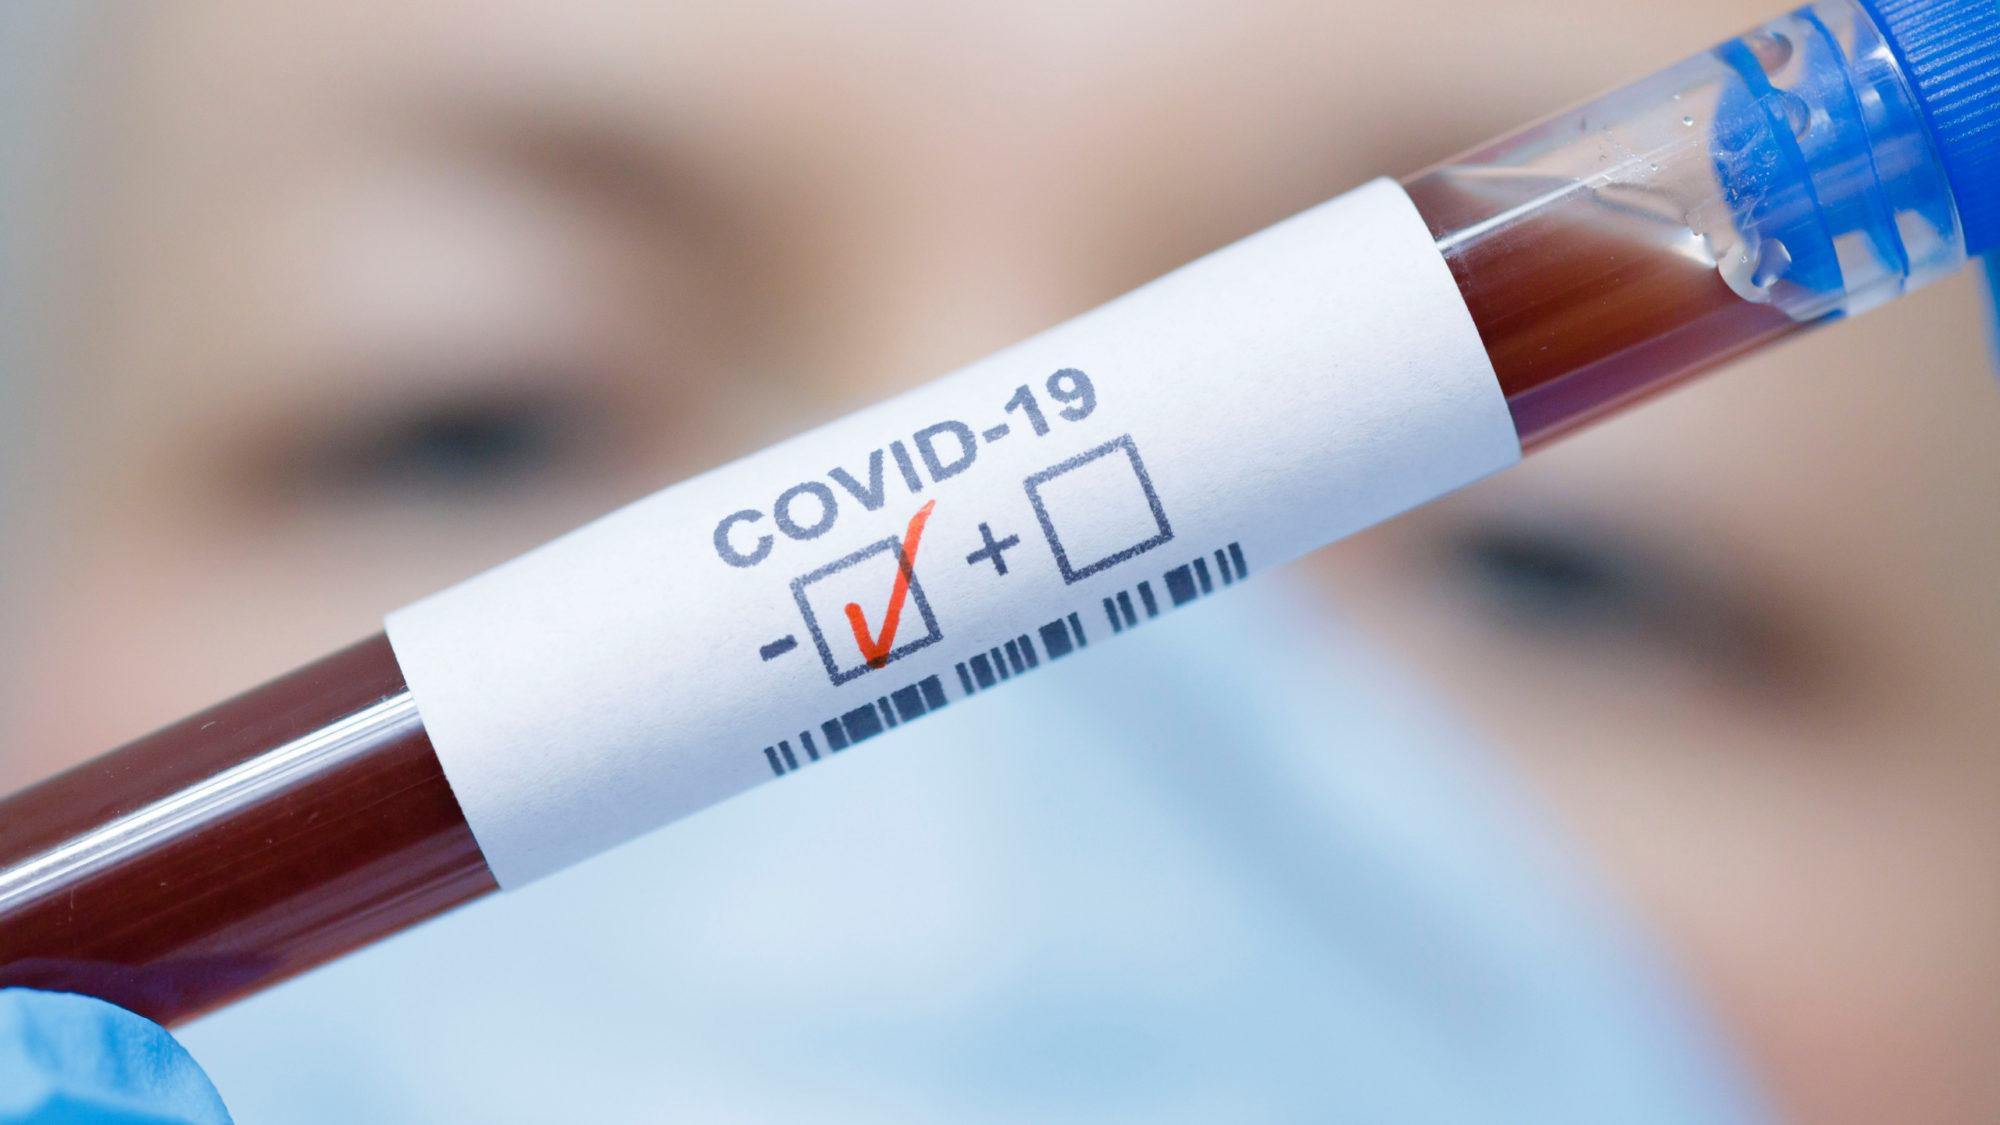 Latvijai pagaidām nedraud Covid-19 testu deficīts